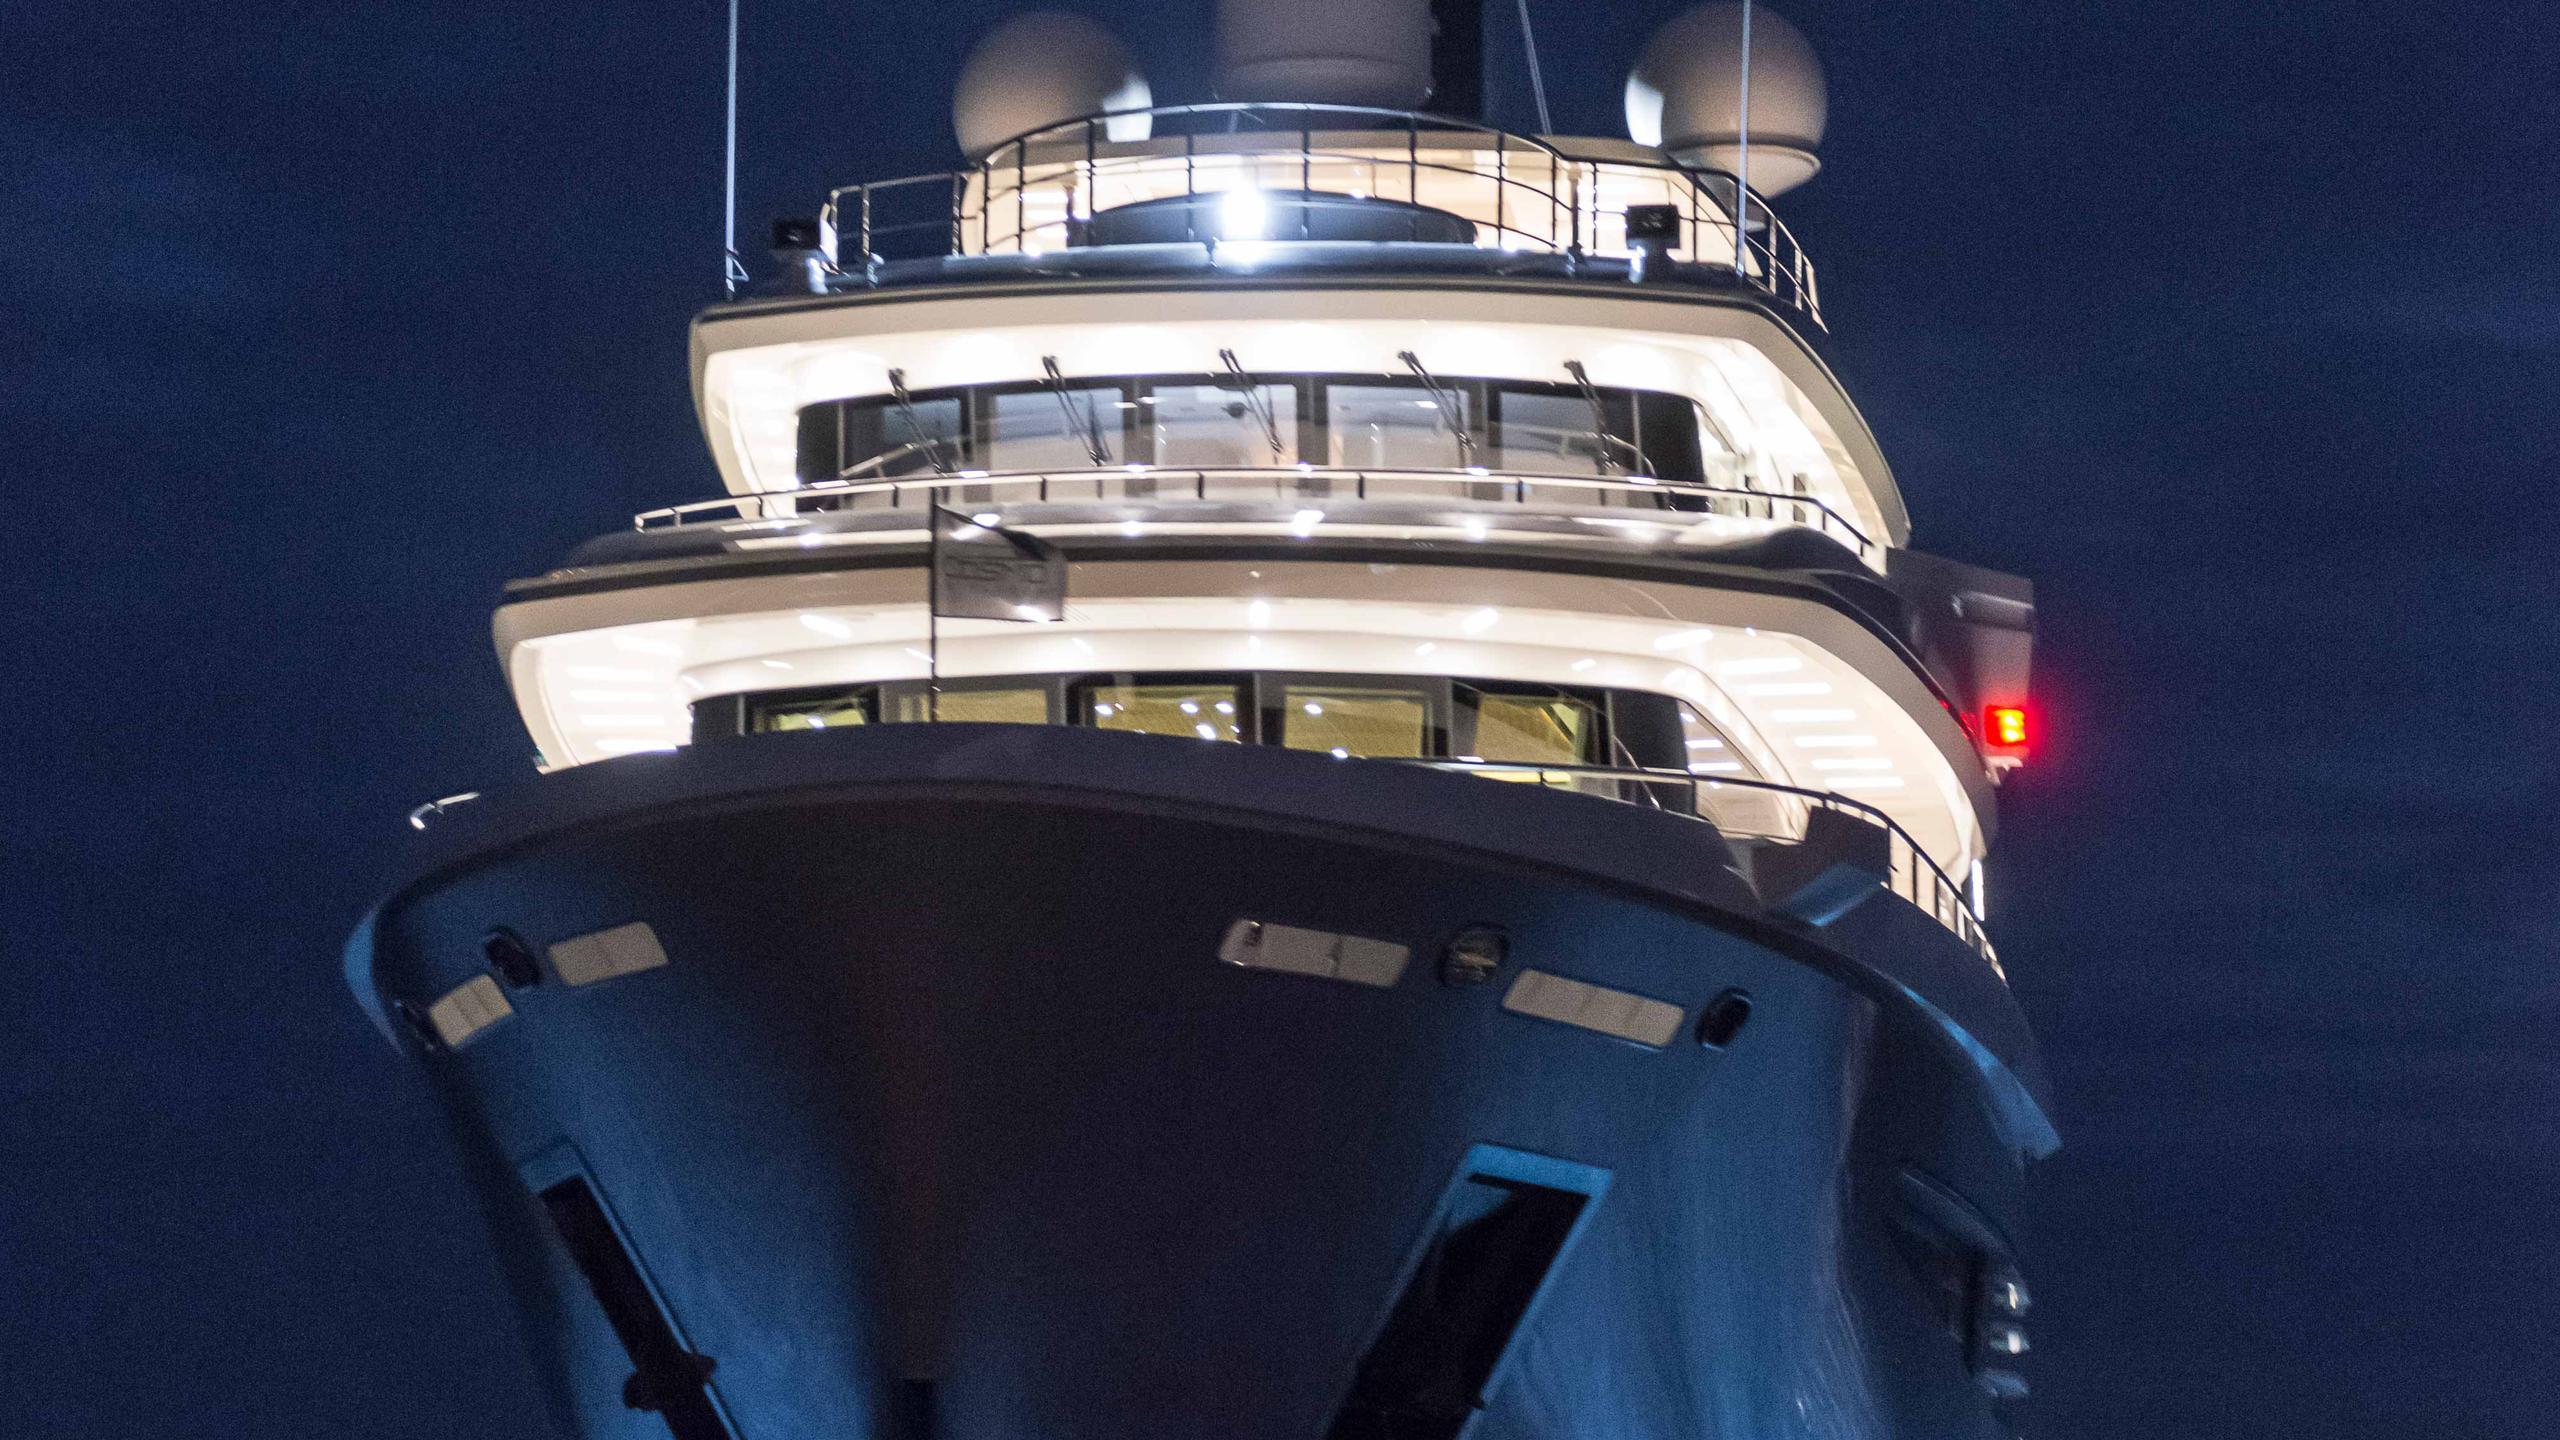 i-nova-explorer-yacht-cosmo-2013-50m-bow-by-night